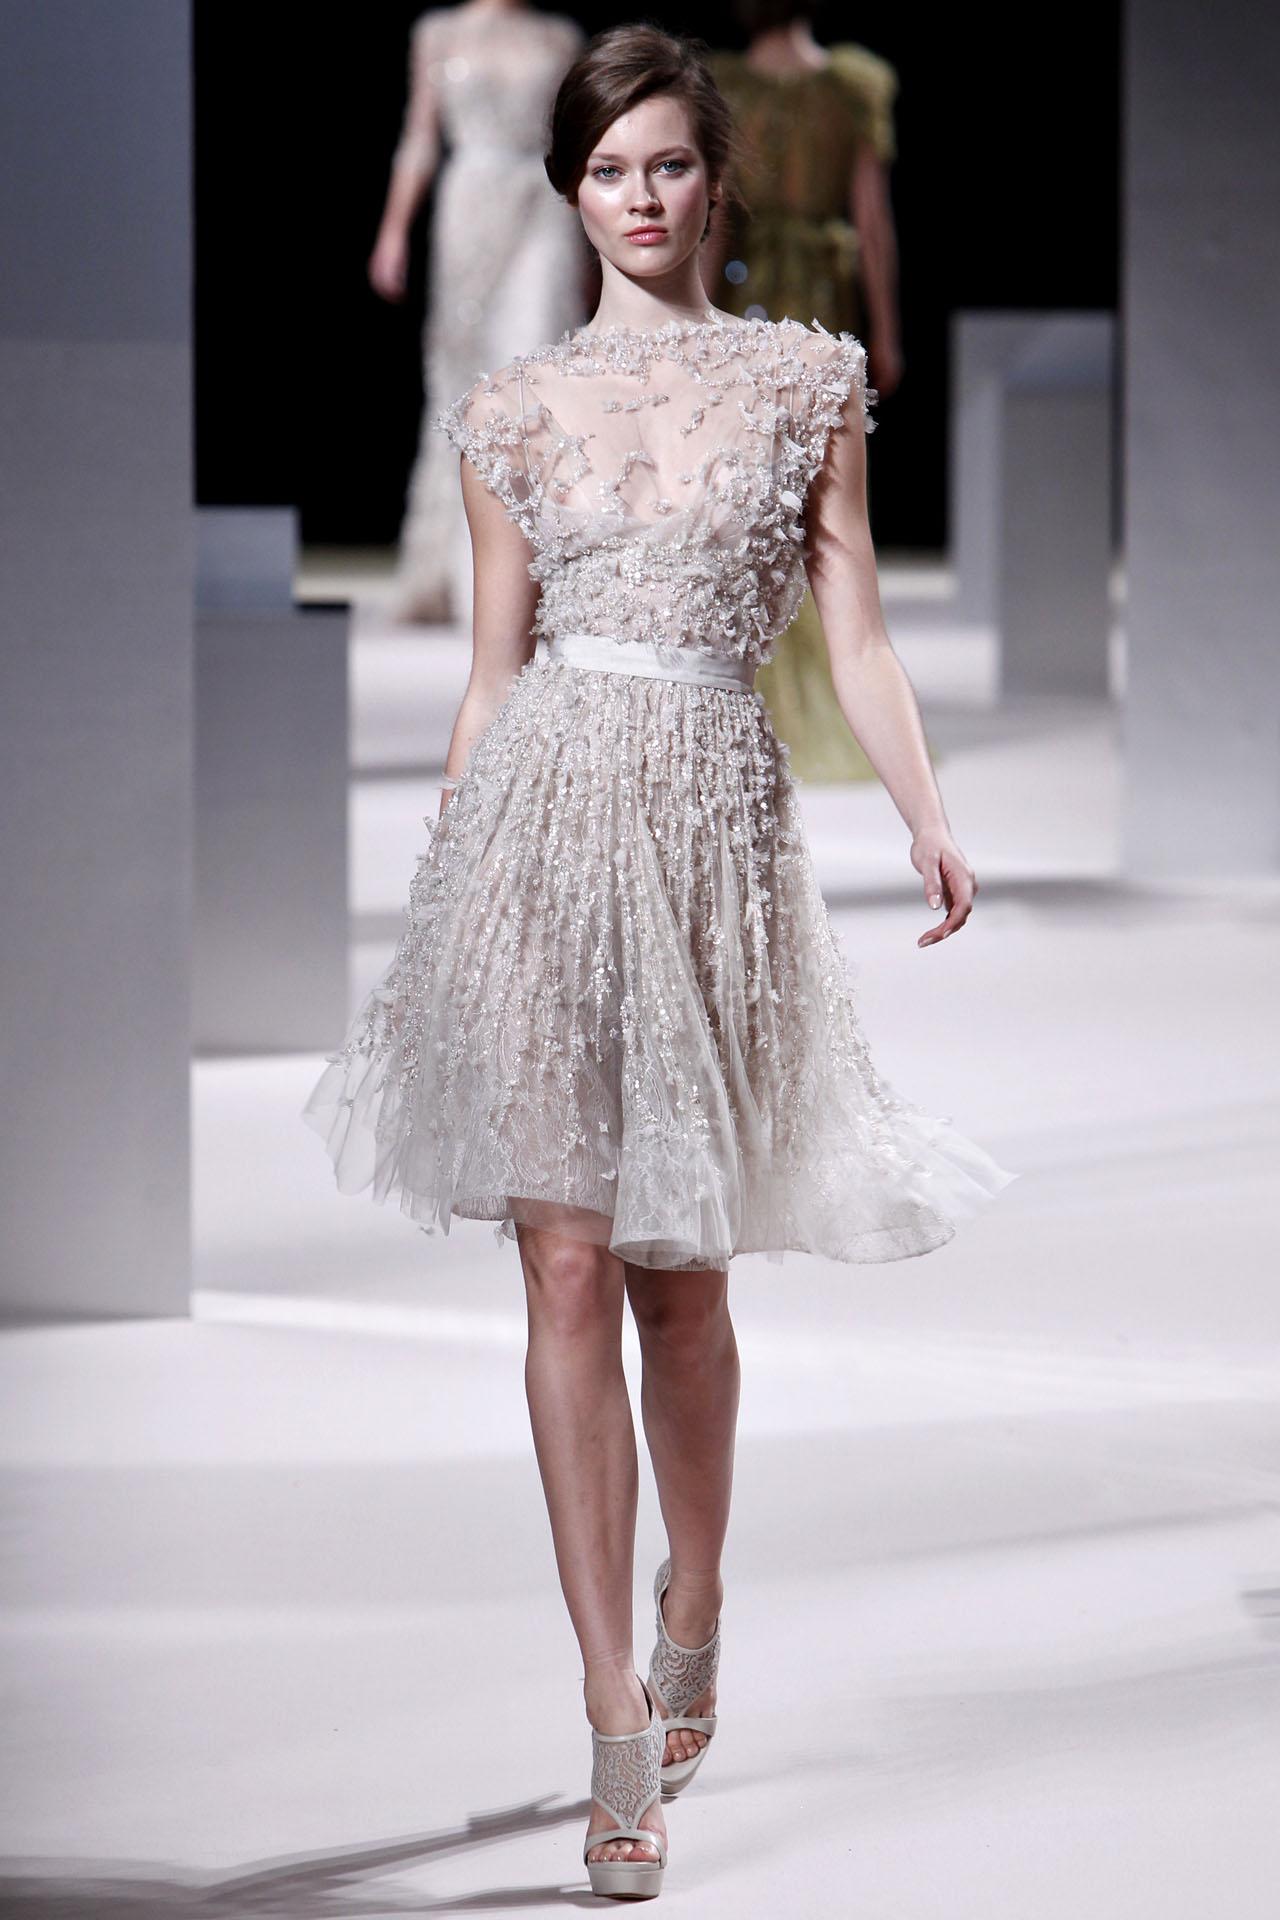 Fashion Friday Style Inspiration: Elie Saab | Peonies&Cupcakes